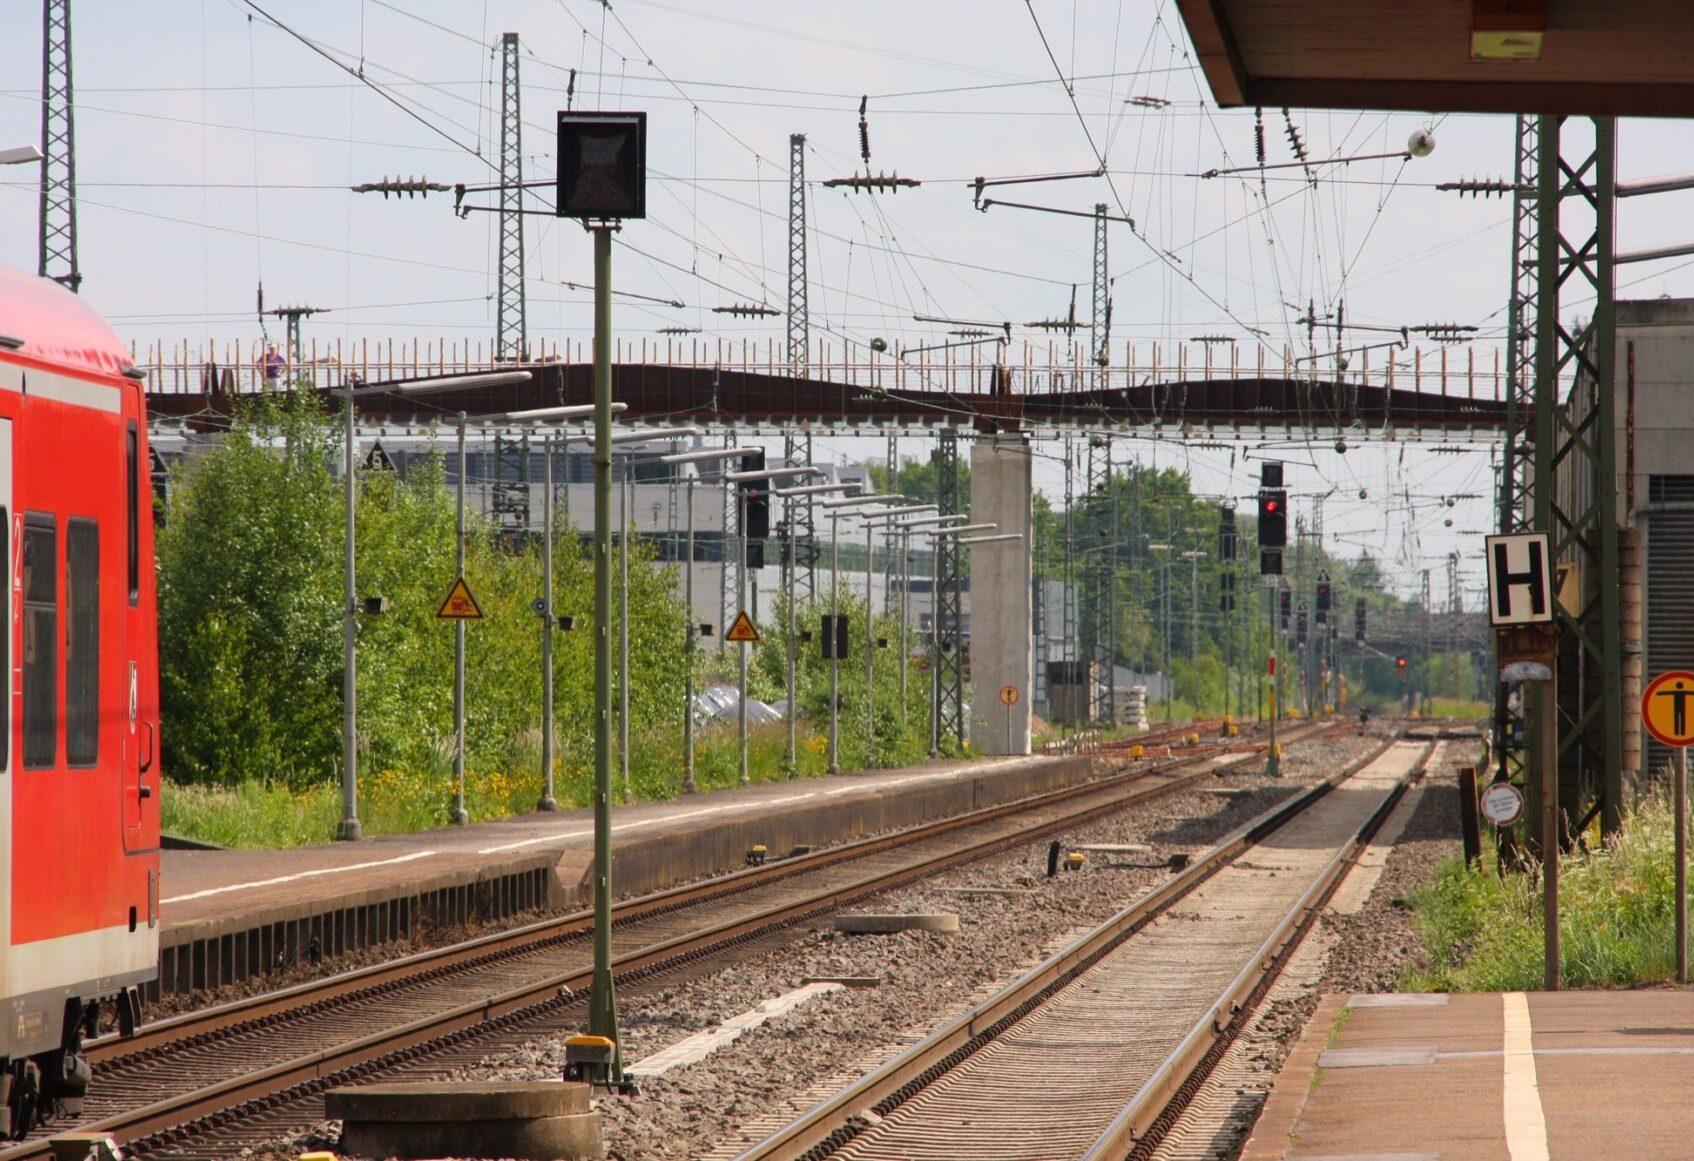 Train on left approaching underneath of bridge in distance